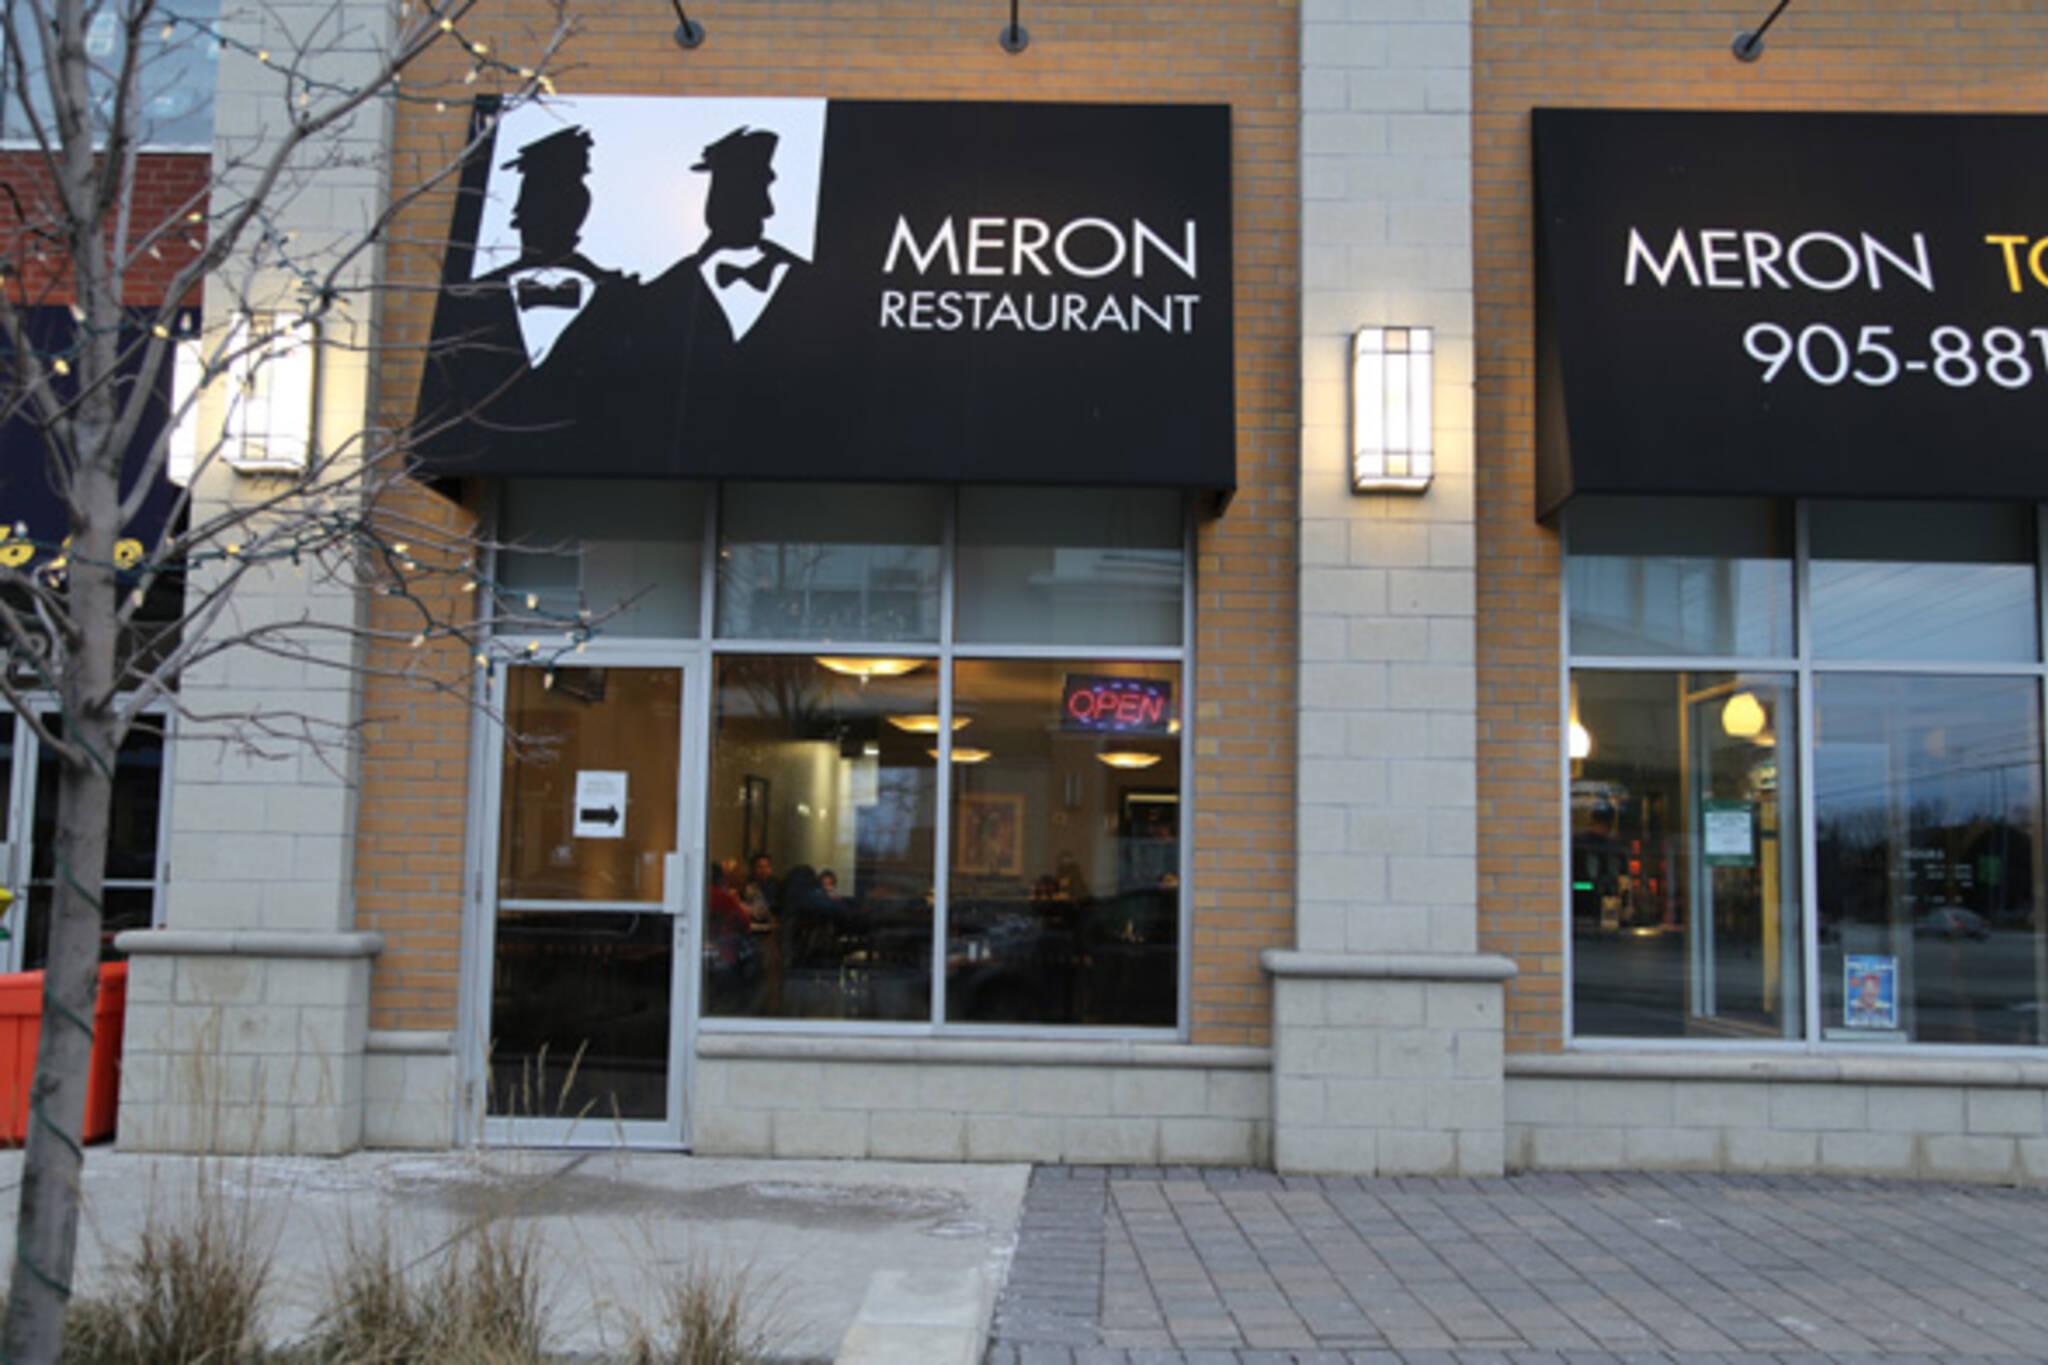 Meron Restaurant